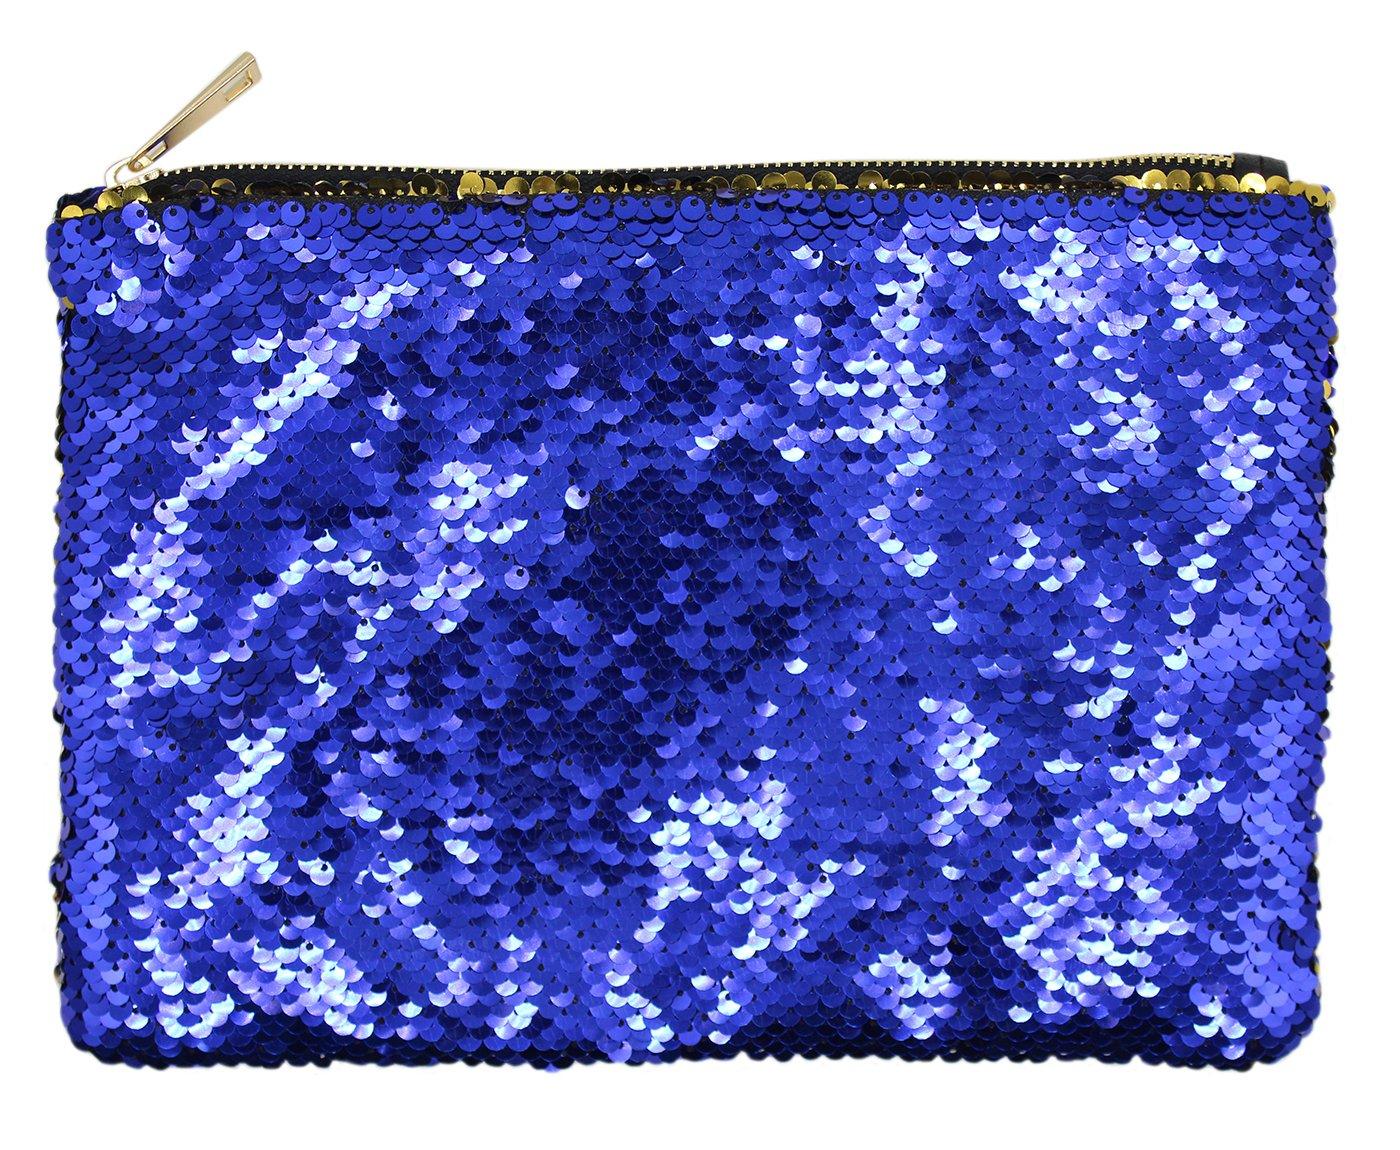 Sequin Pouch Makeup Cosmetic Bag Reversible Sequin Handbag Bling Glitter Evening Party Mermaid Clutch Beauty Bag Purse